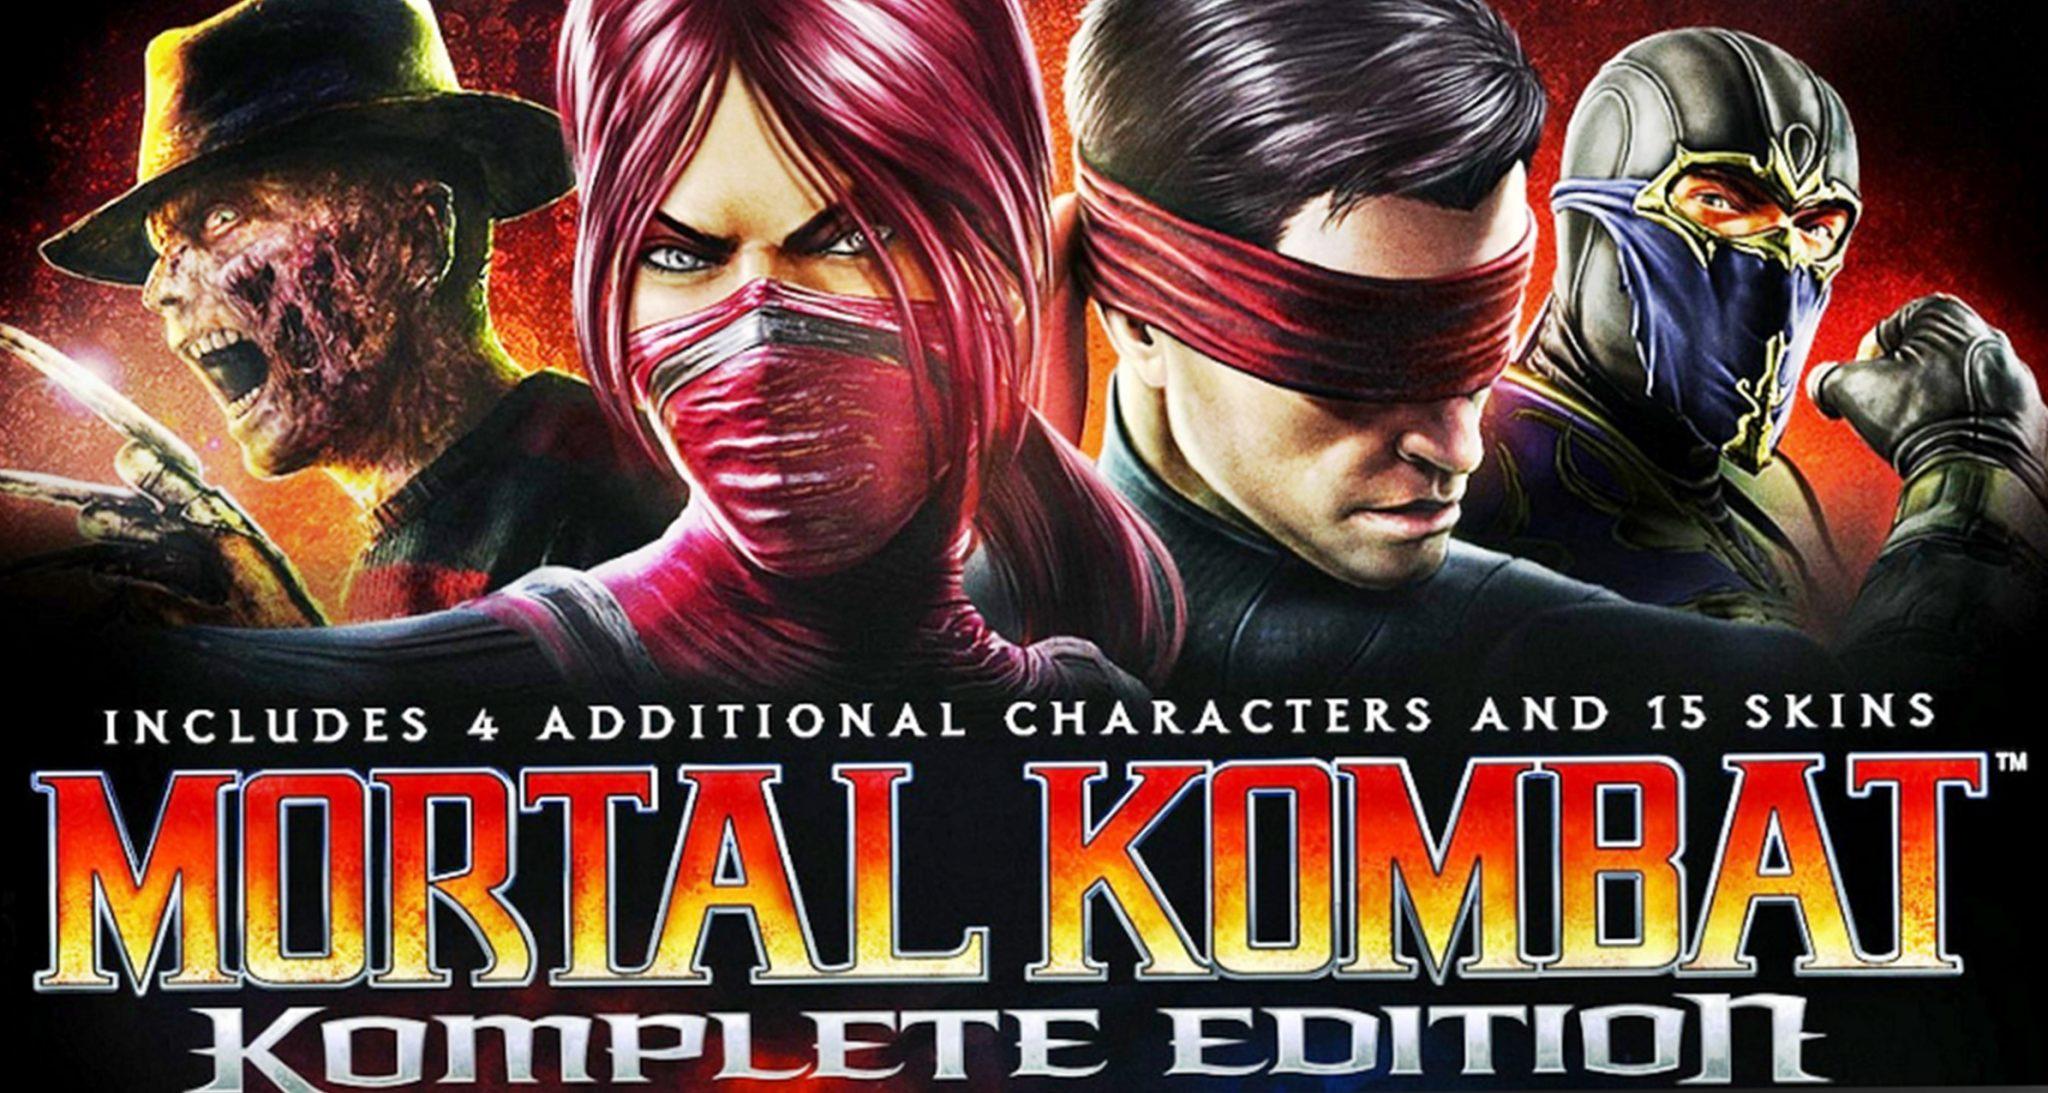 Mortal kombat komplete edition Download Free